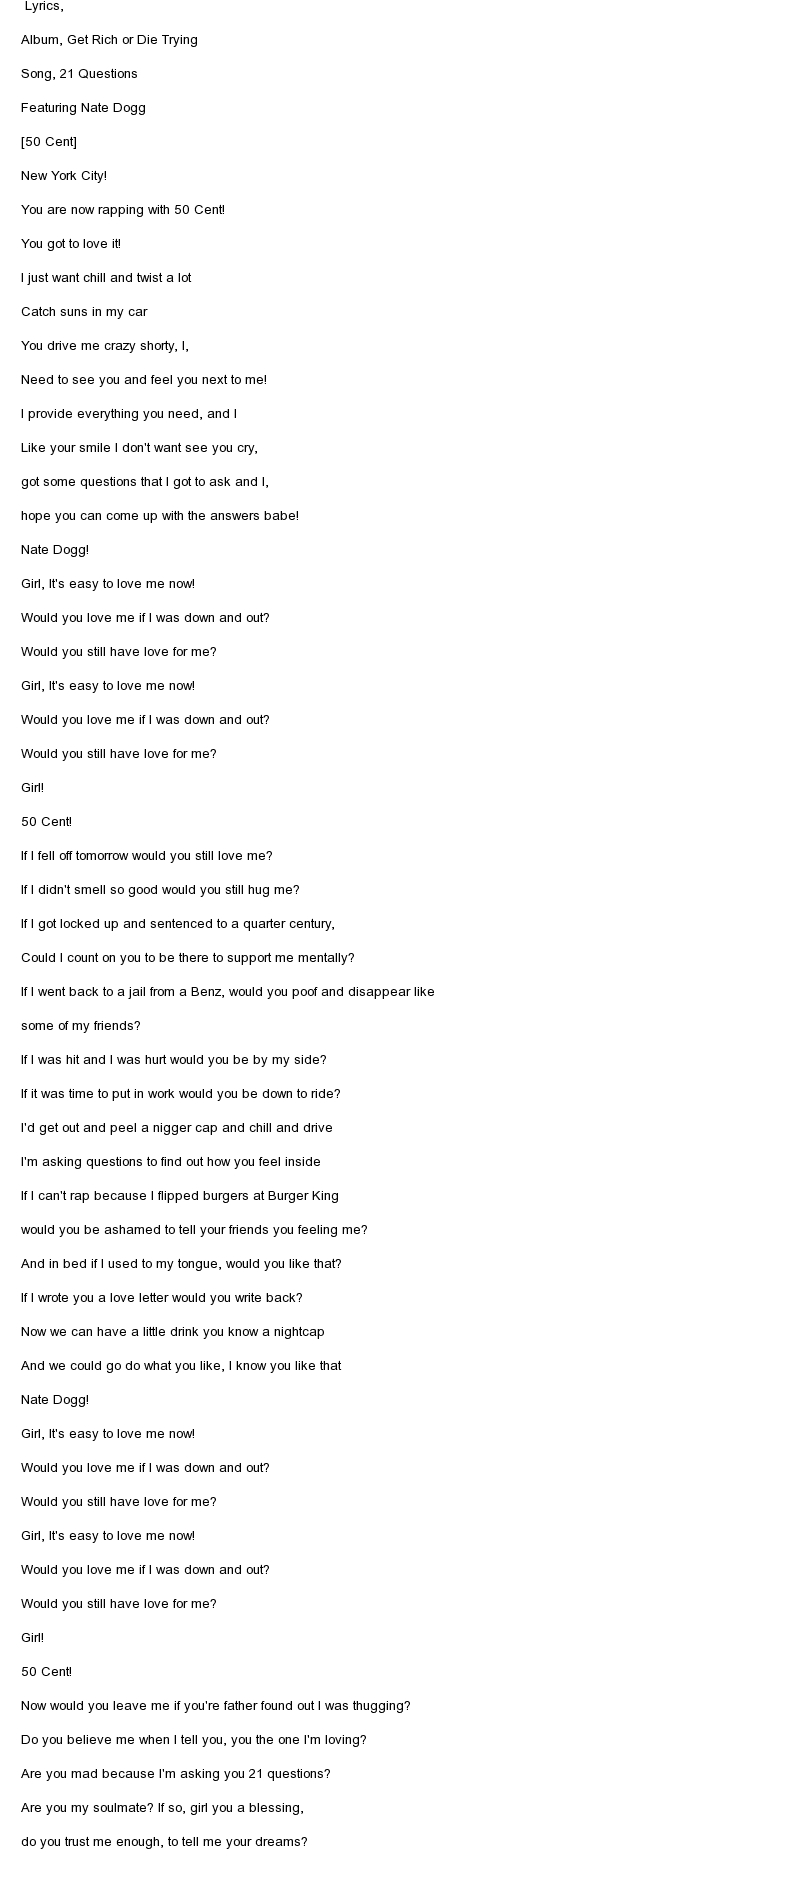 adding song lyrics to an essay